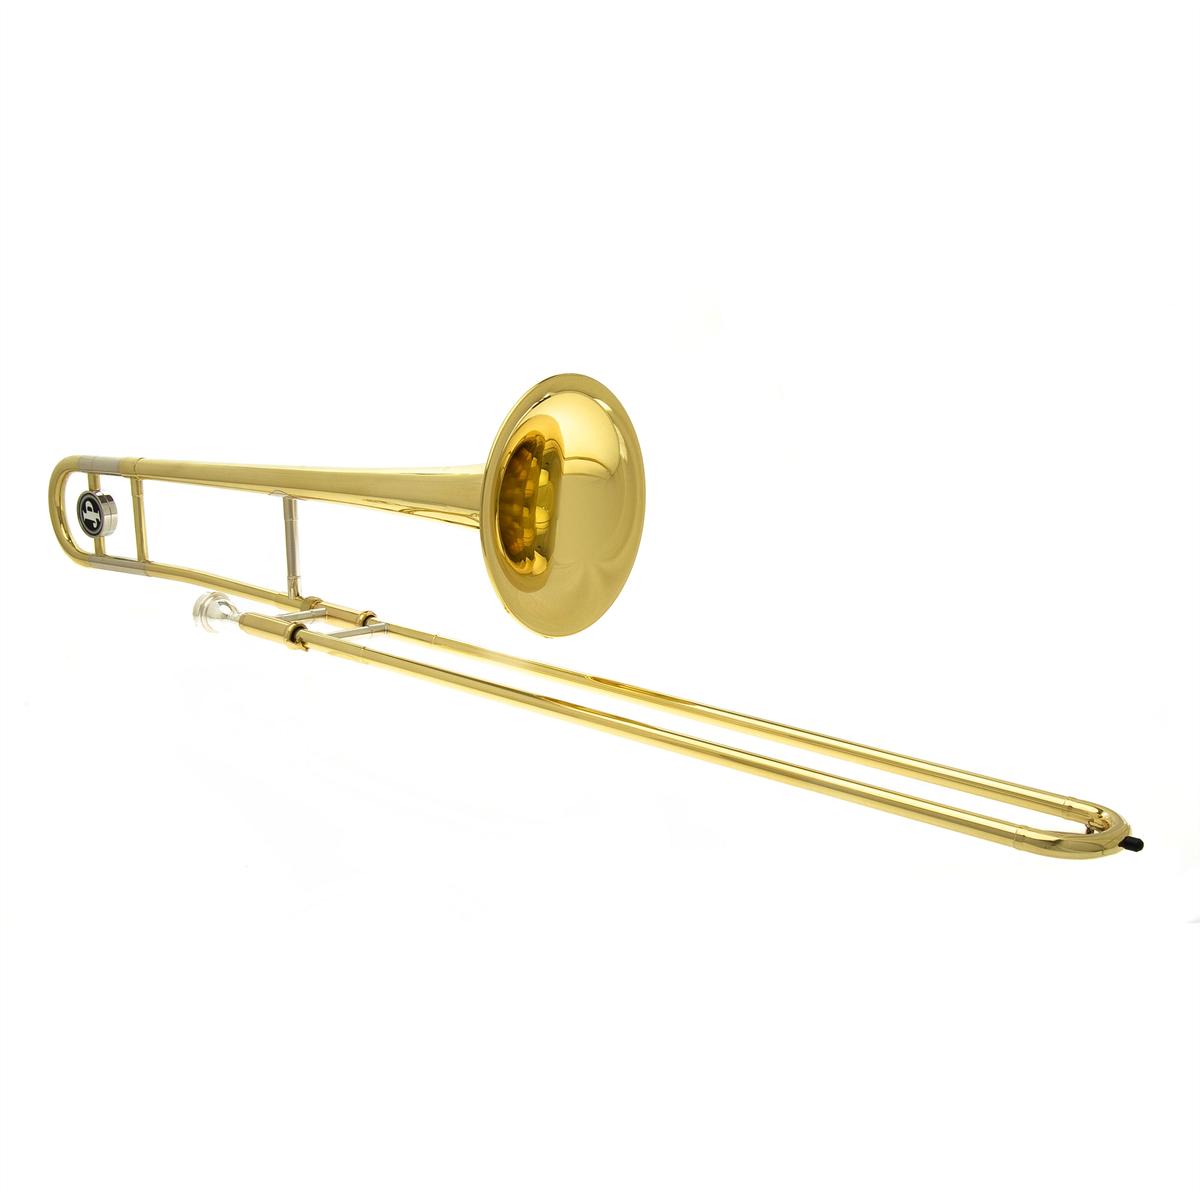 John Packer Tenor Trombone JP031 M Boring - Uitvoering: Goudlak